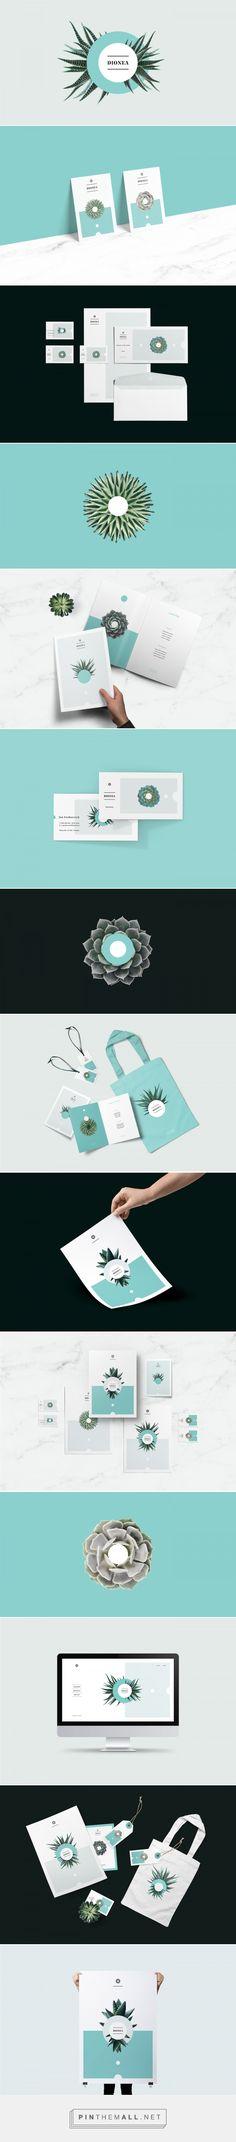 Dionea Branding by Przemek Bizori   Fivestar Branding Agency – Design and Branding Agency & Curated Inspiration Gallery